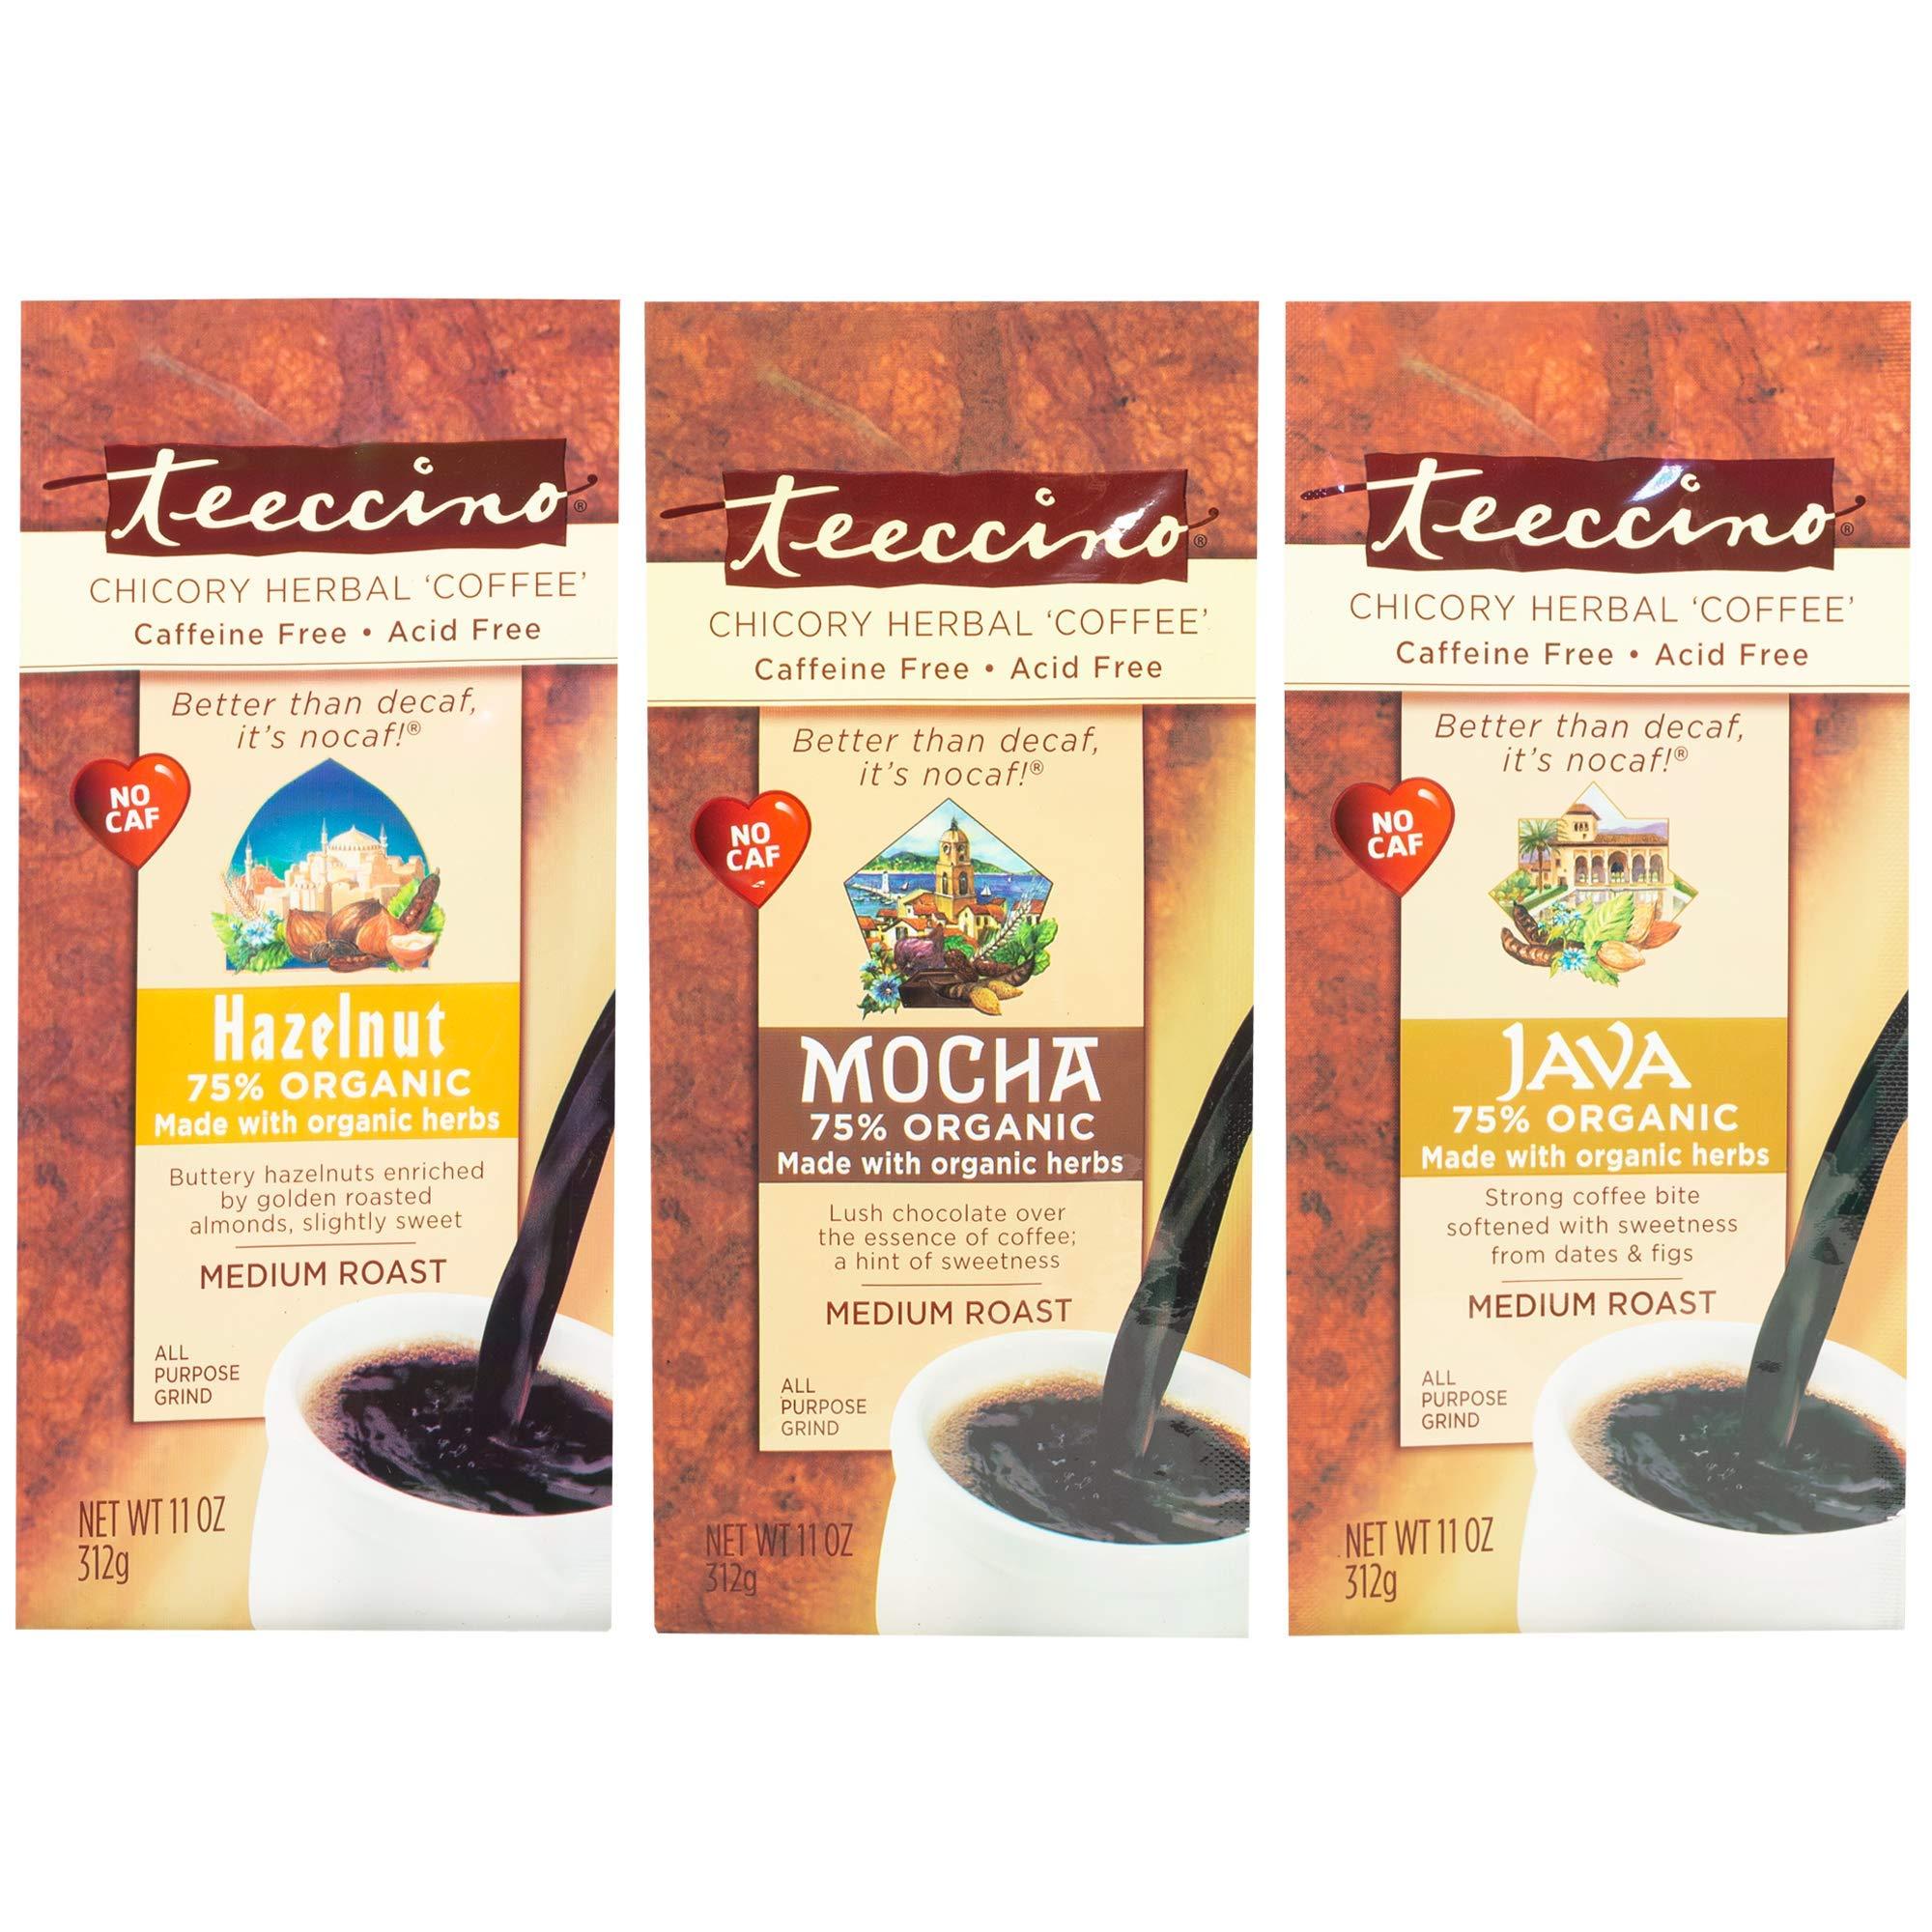 Teeccino Chicory Herbal Coffee Variety Pack (Java, Mocha, Hazelnut), Caffeine Free, Acid Free, Coffee Alternative, Prebiotic, 11 Ounce (Pack of 3) by Teeccino